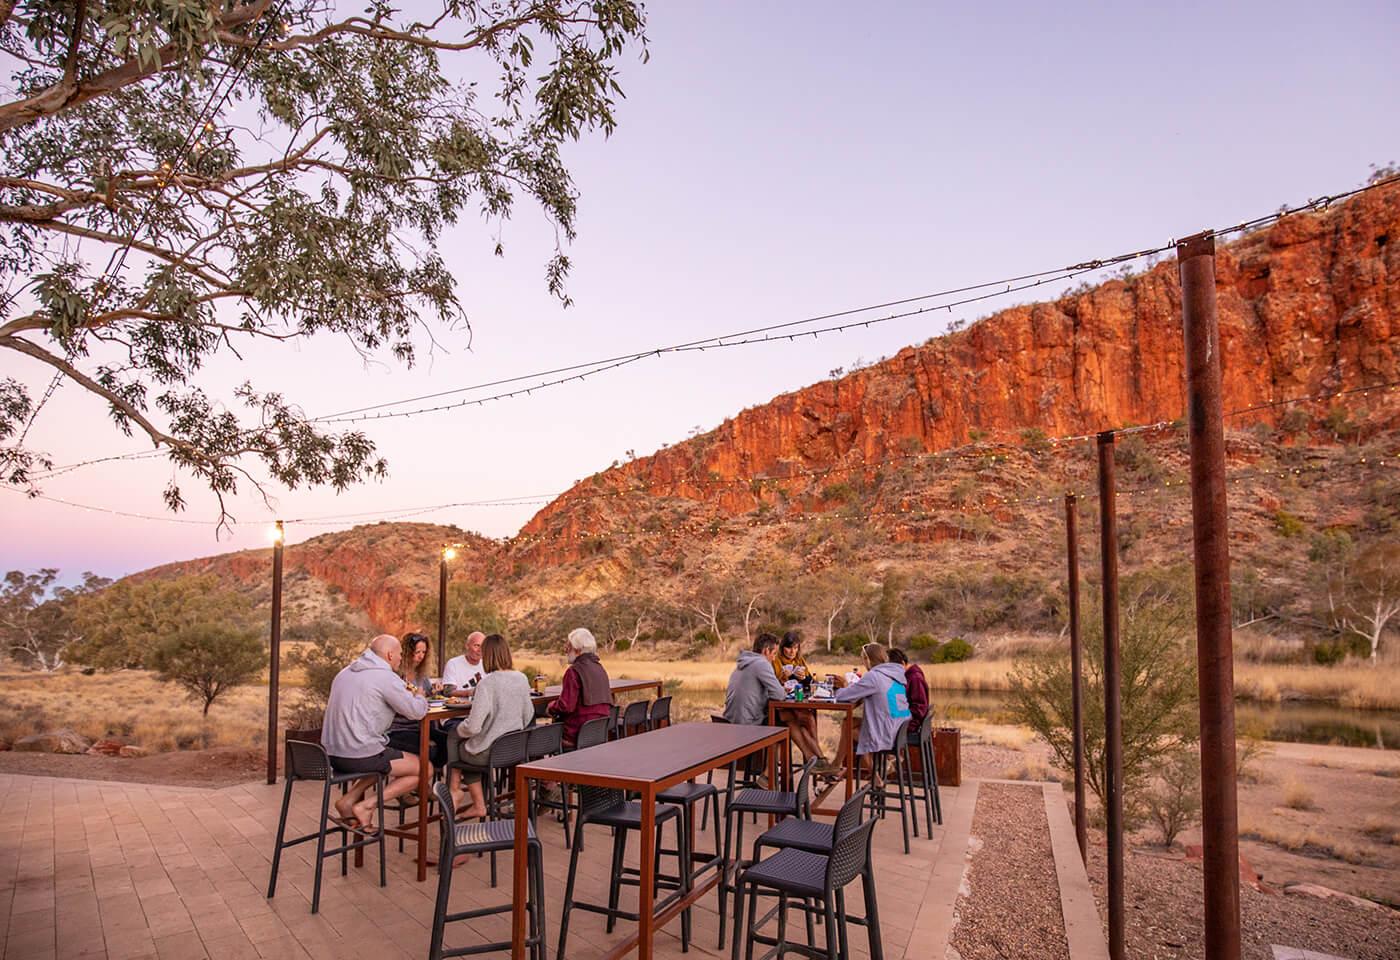 West Macdonnell Ranges at Glen Helen, Alice Springs by Greg Sullavan